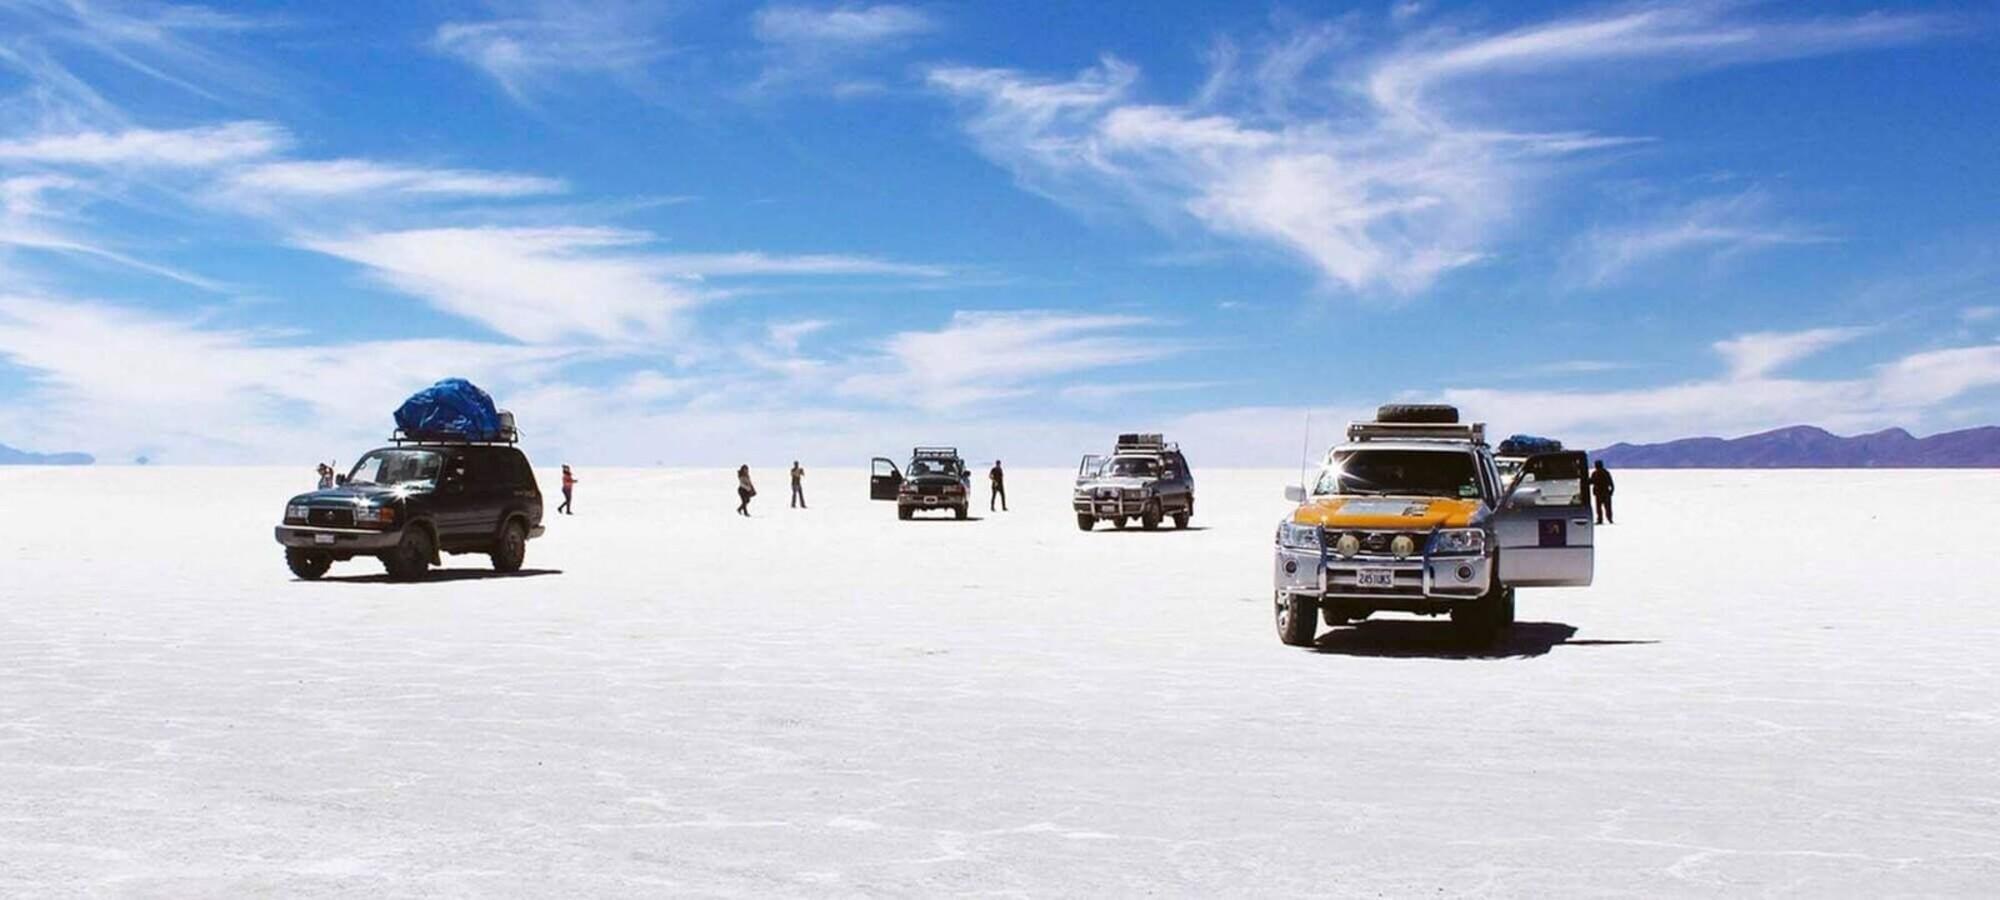 Джип туры по Алтаю 2020 от туроператора Большой Алтай